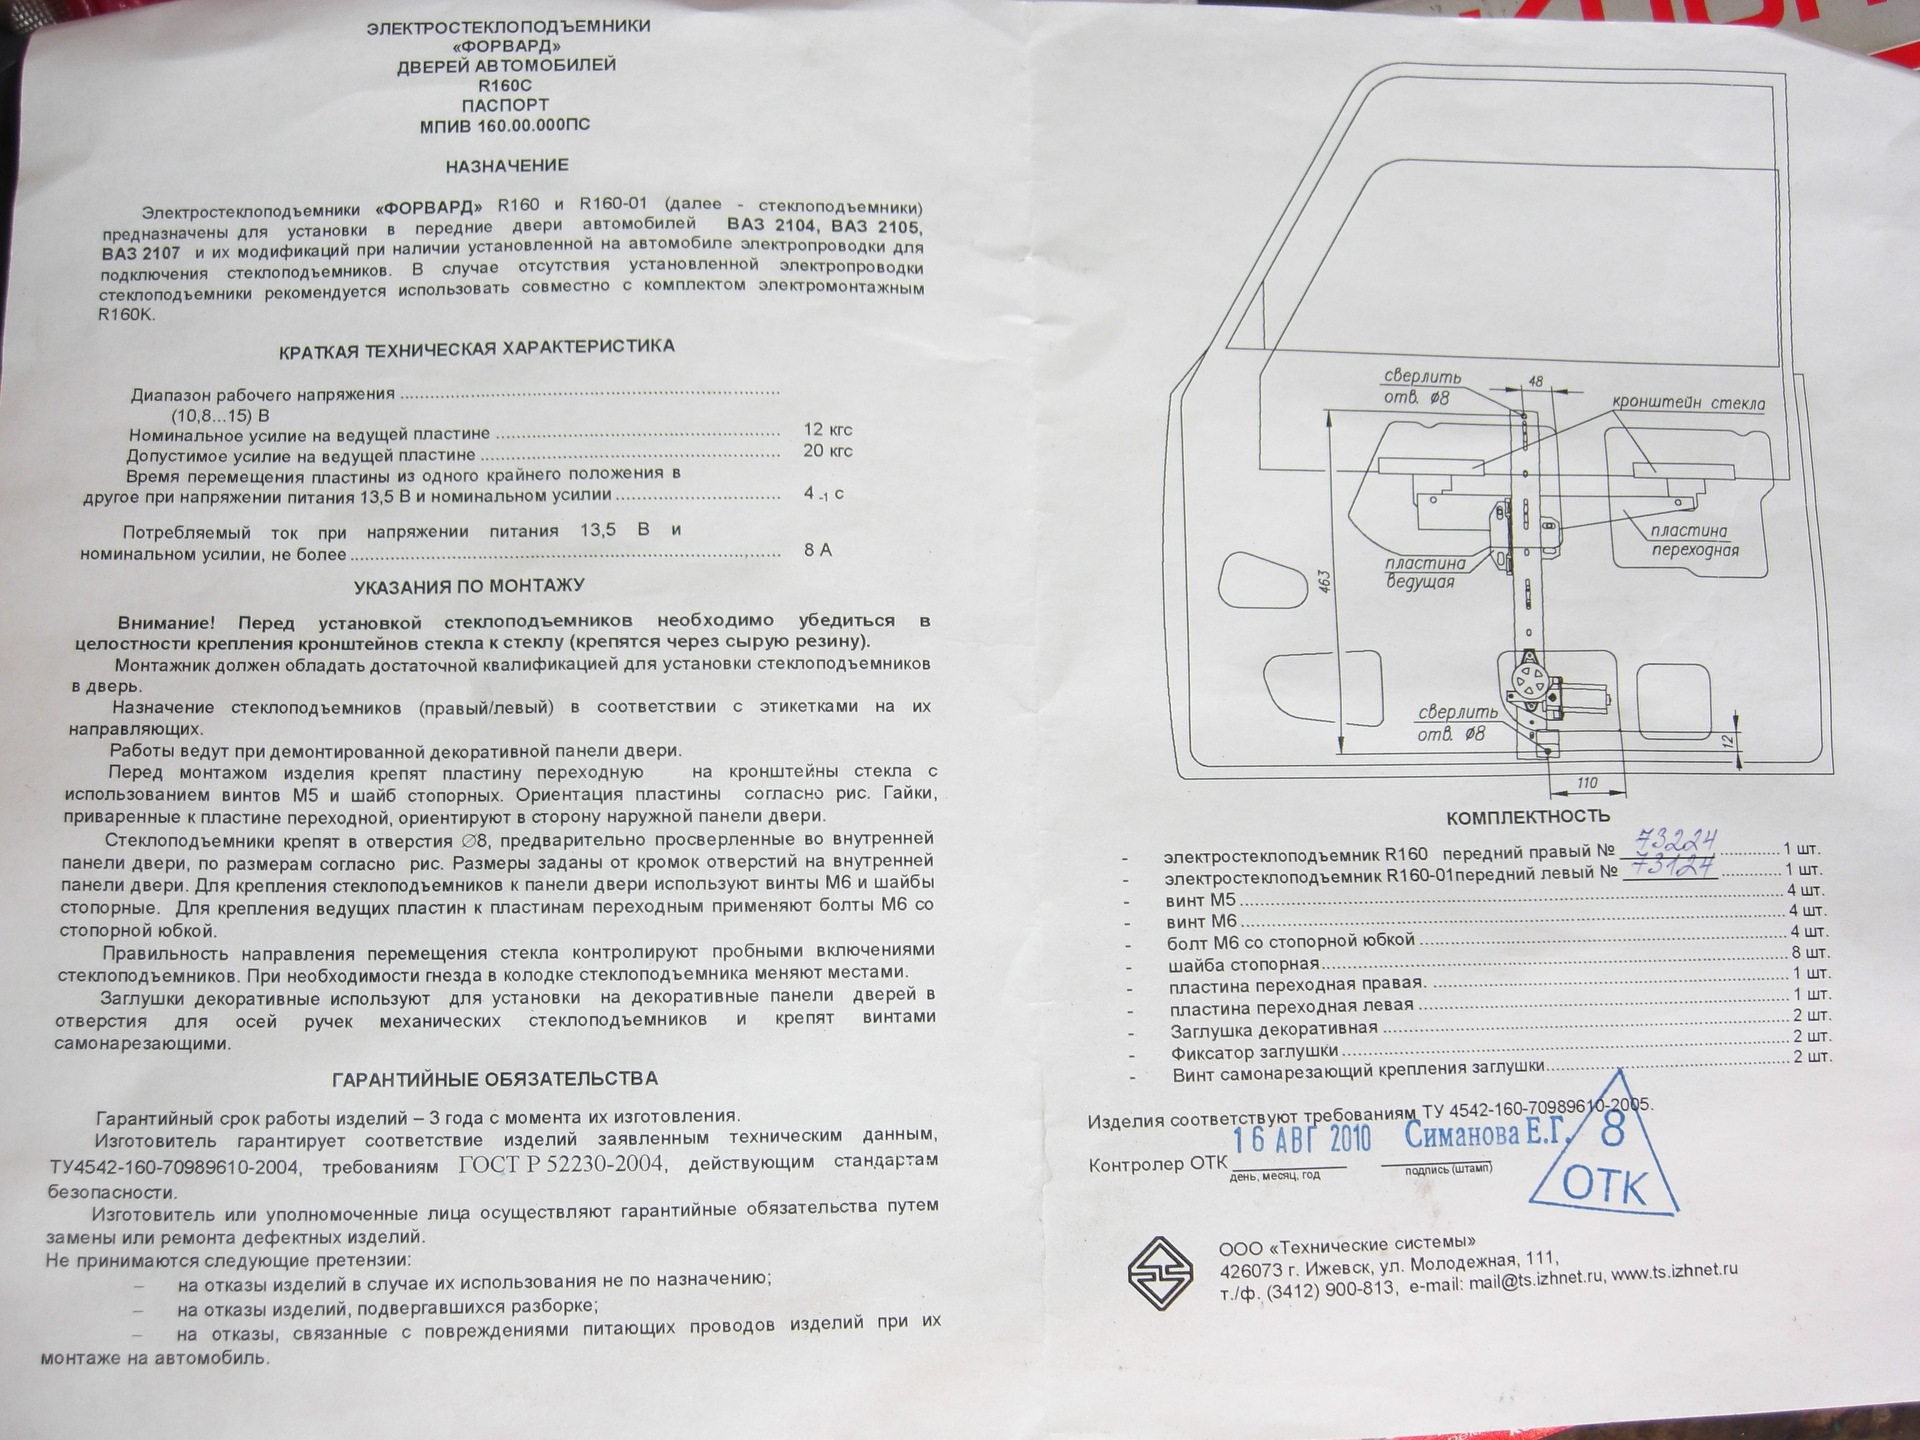 Схема установки стеклоподъемников форвард ваз 2107